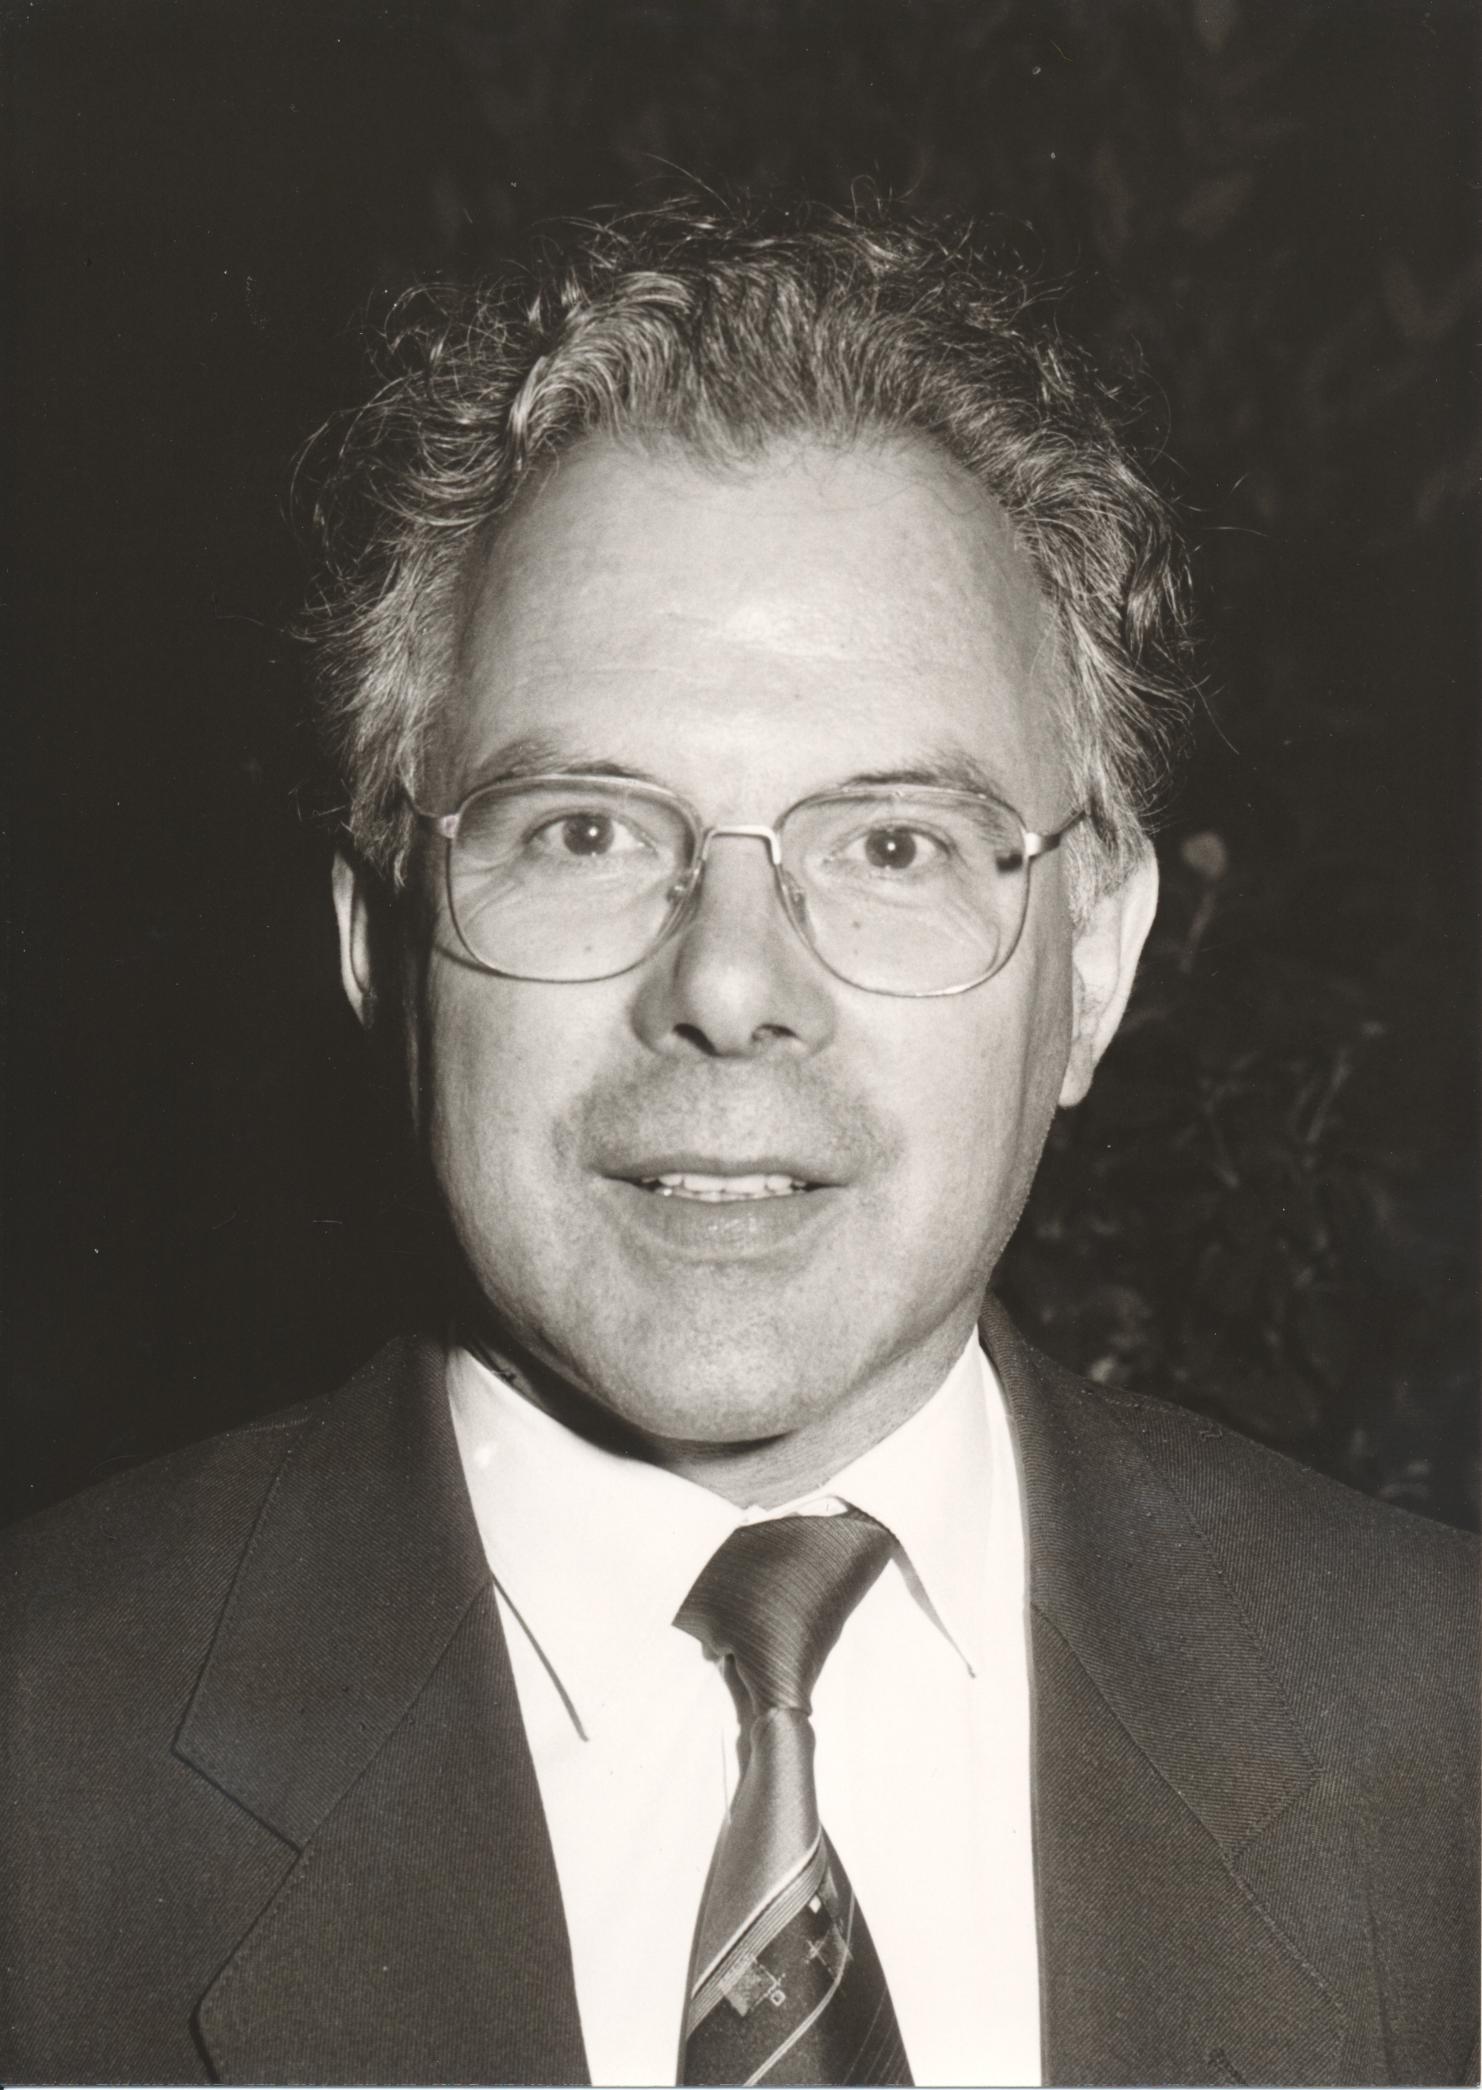 XIII. Imago Mundi-Kongress 1991, Innsbruck, Prof. DDr. Andreas Resch